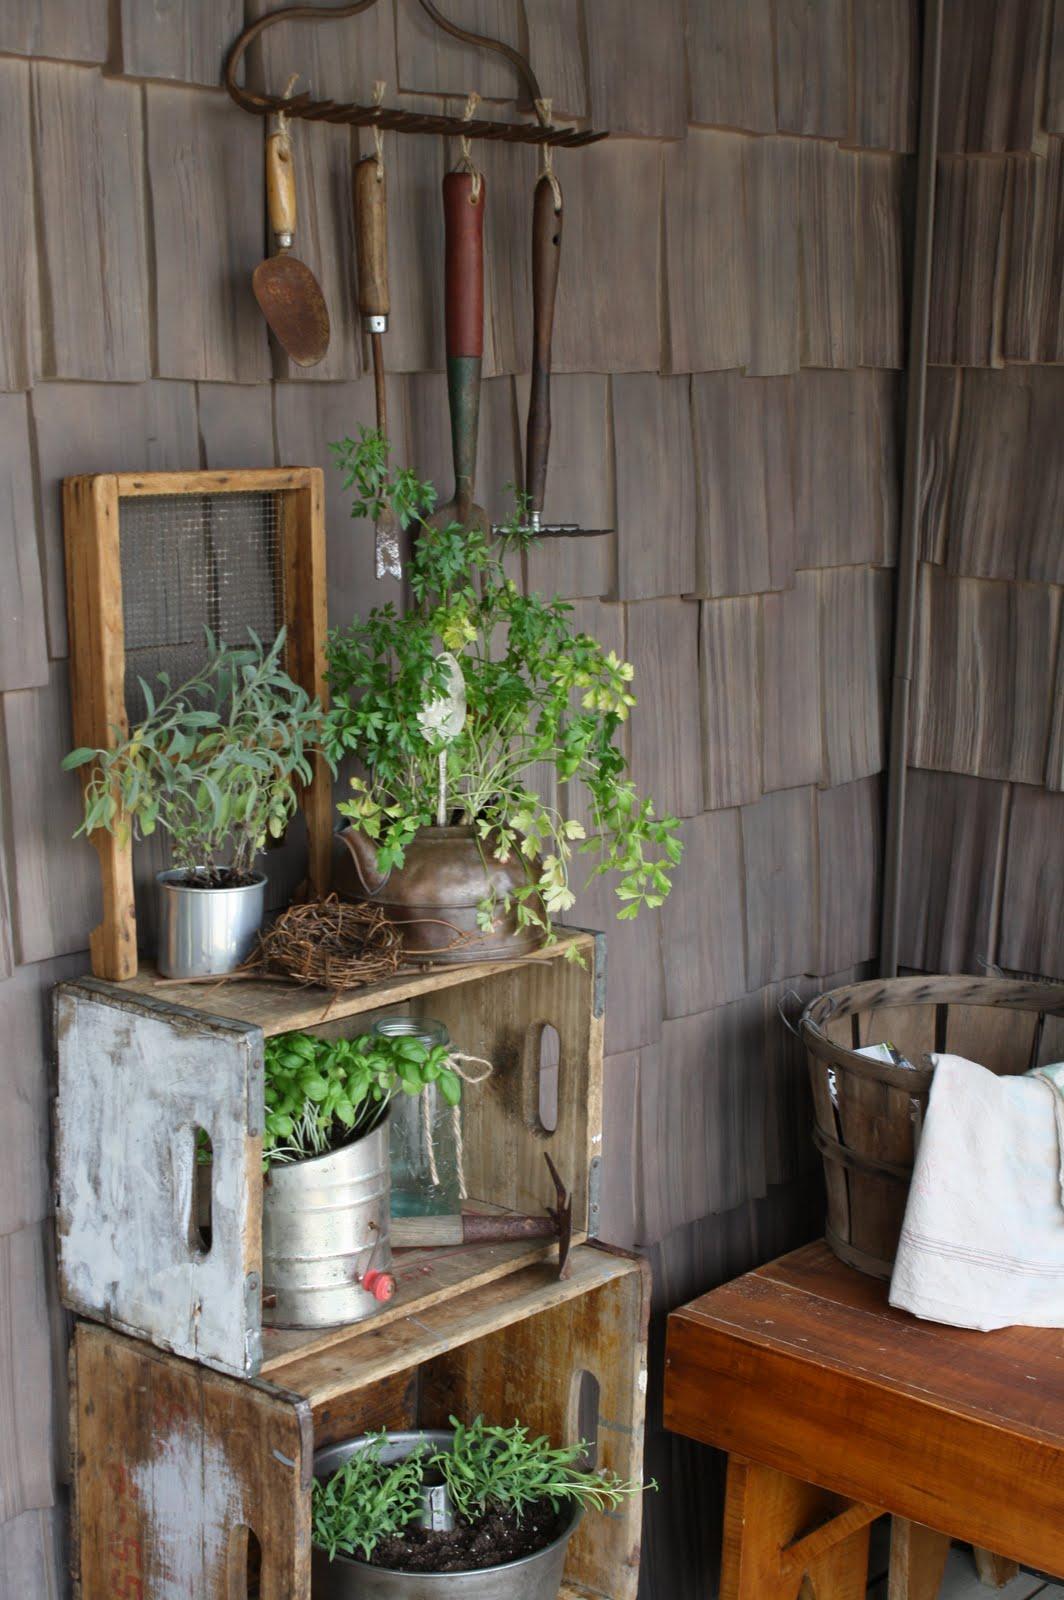 Umelecky Country Porch Gardening